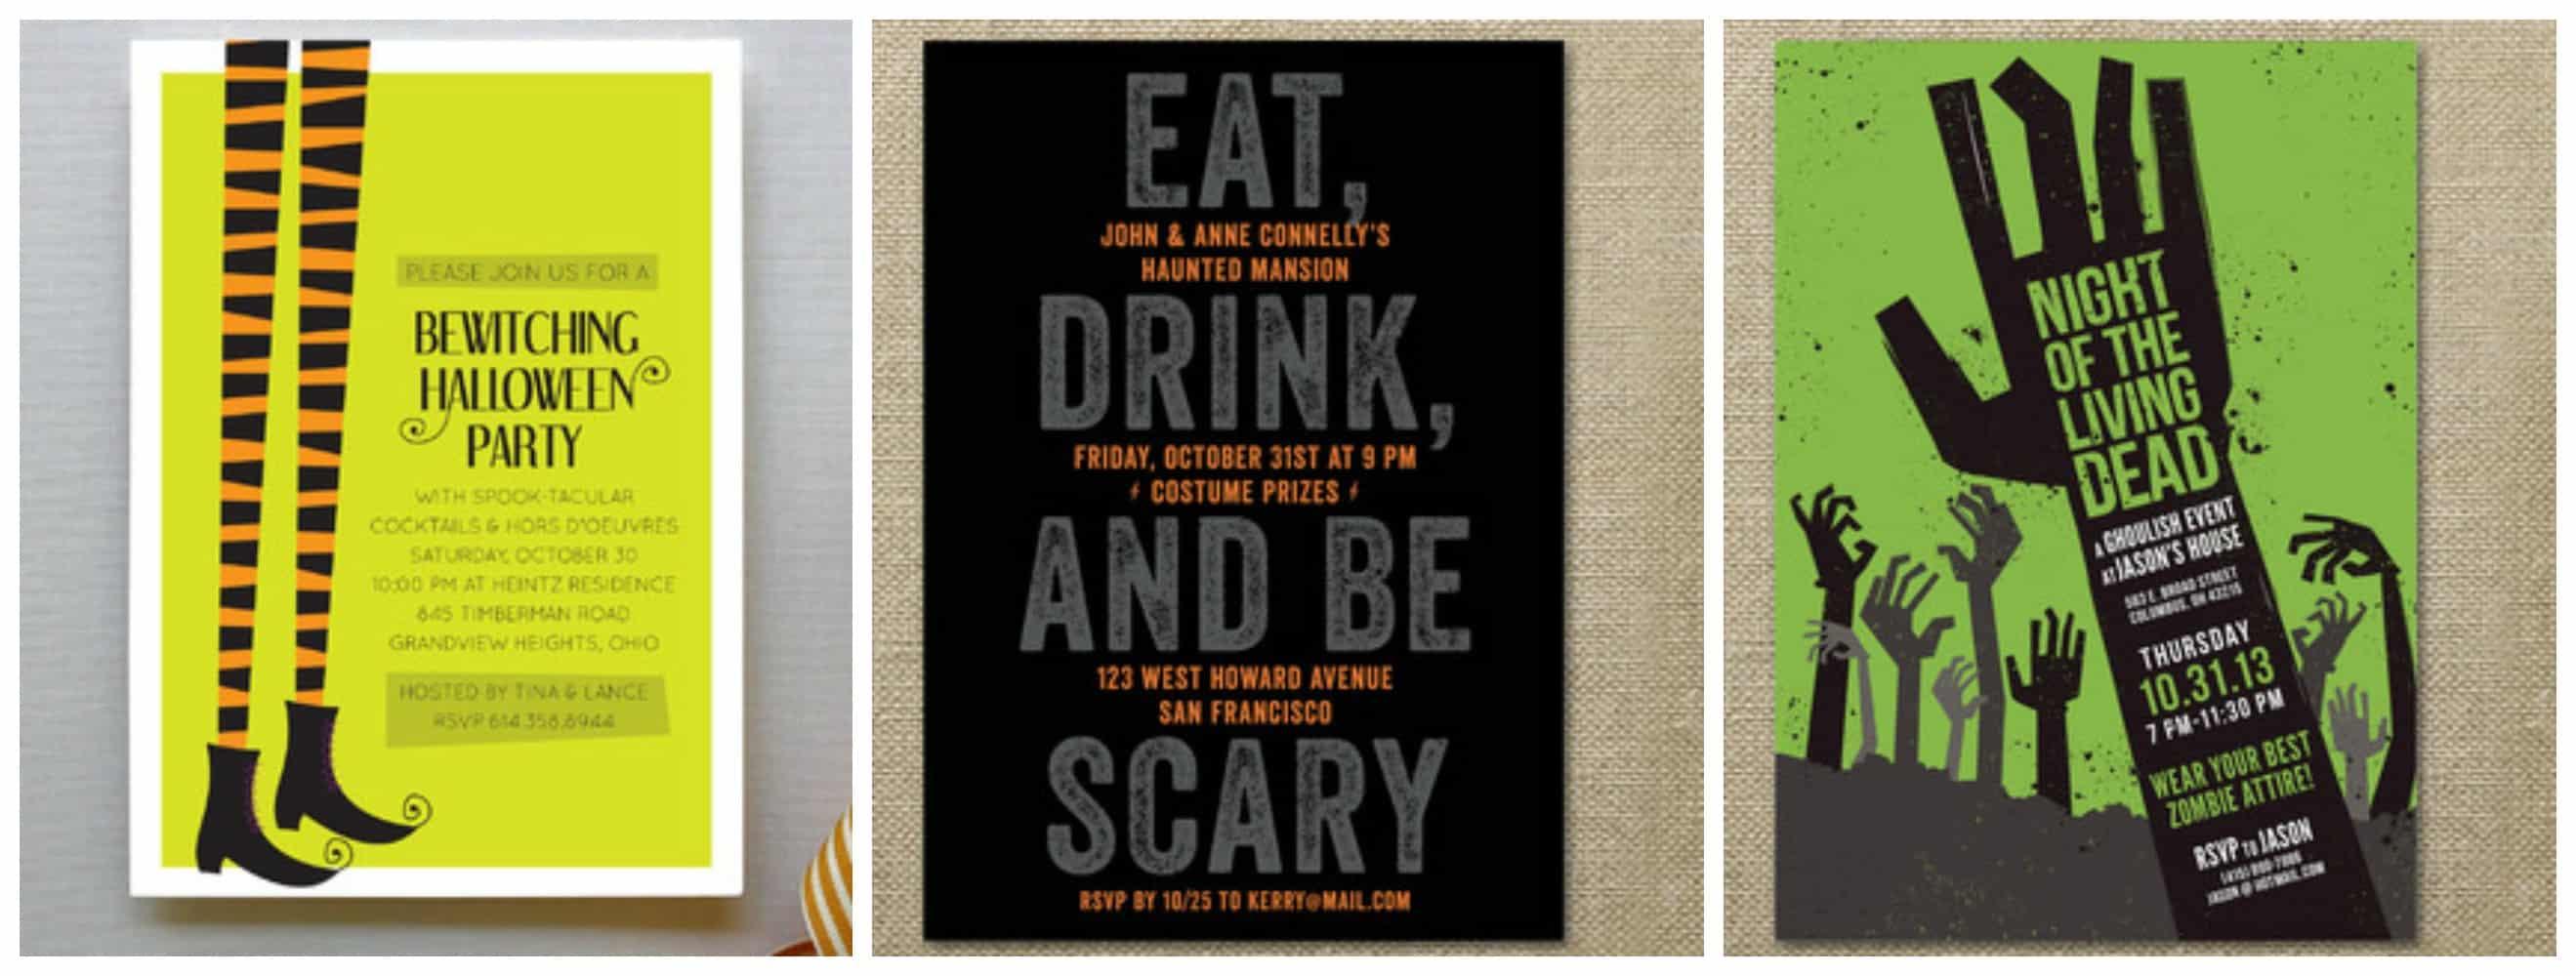 Celebrating Halloween with Minted.com - Mom vs the Boys